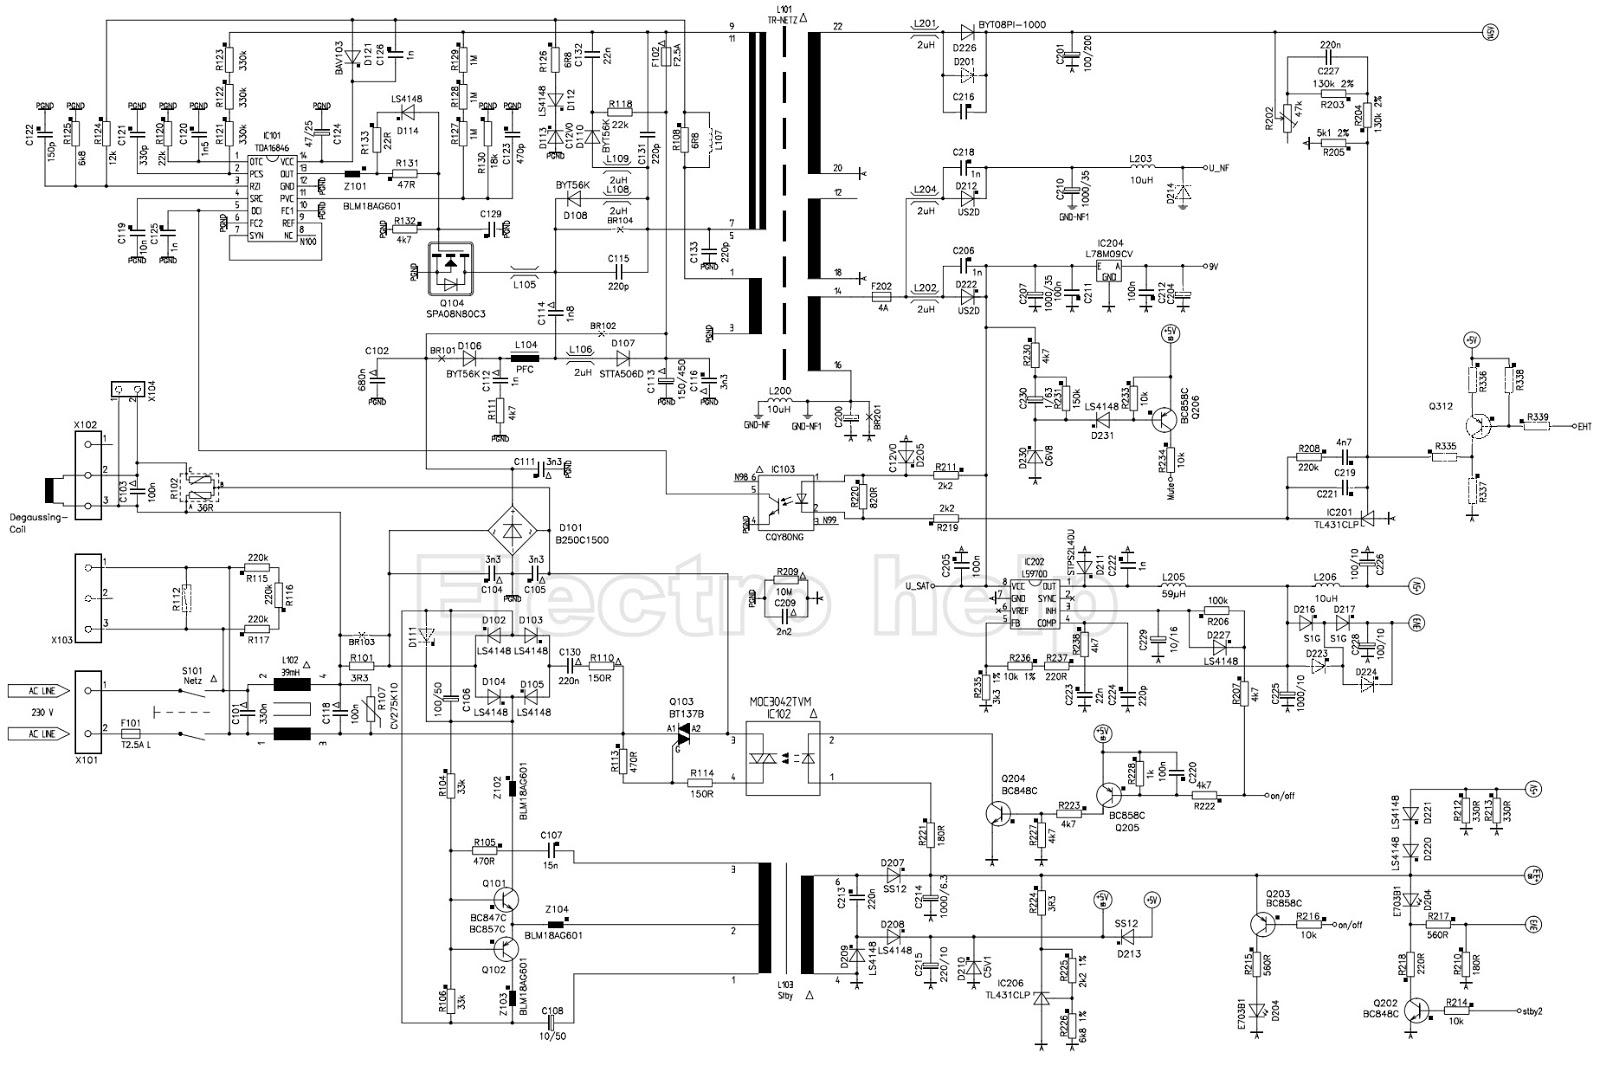 pnp npn wiring diagram symbols npn pnp symbol wiring